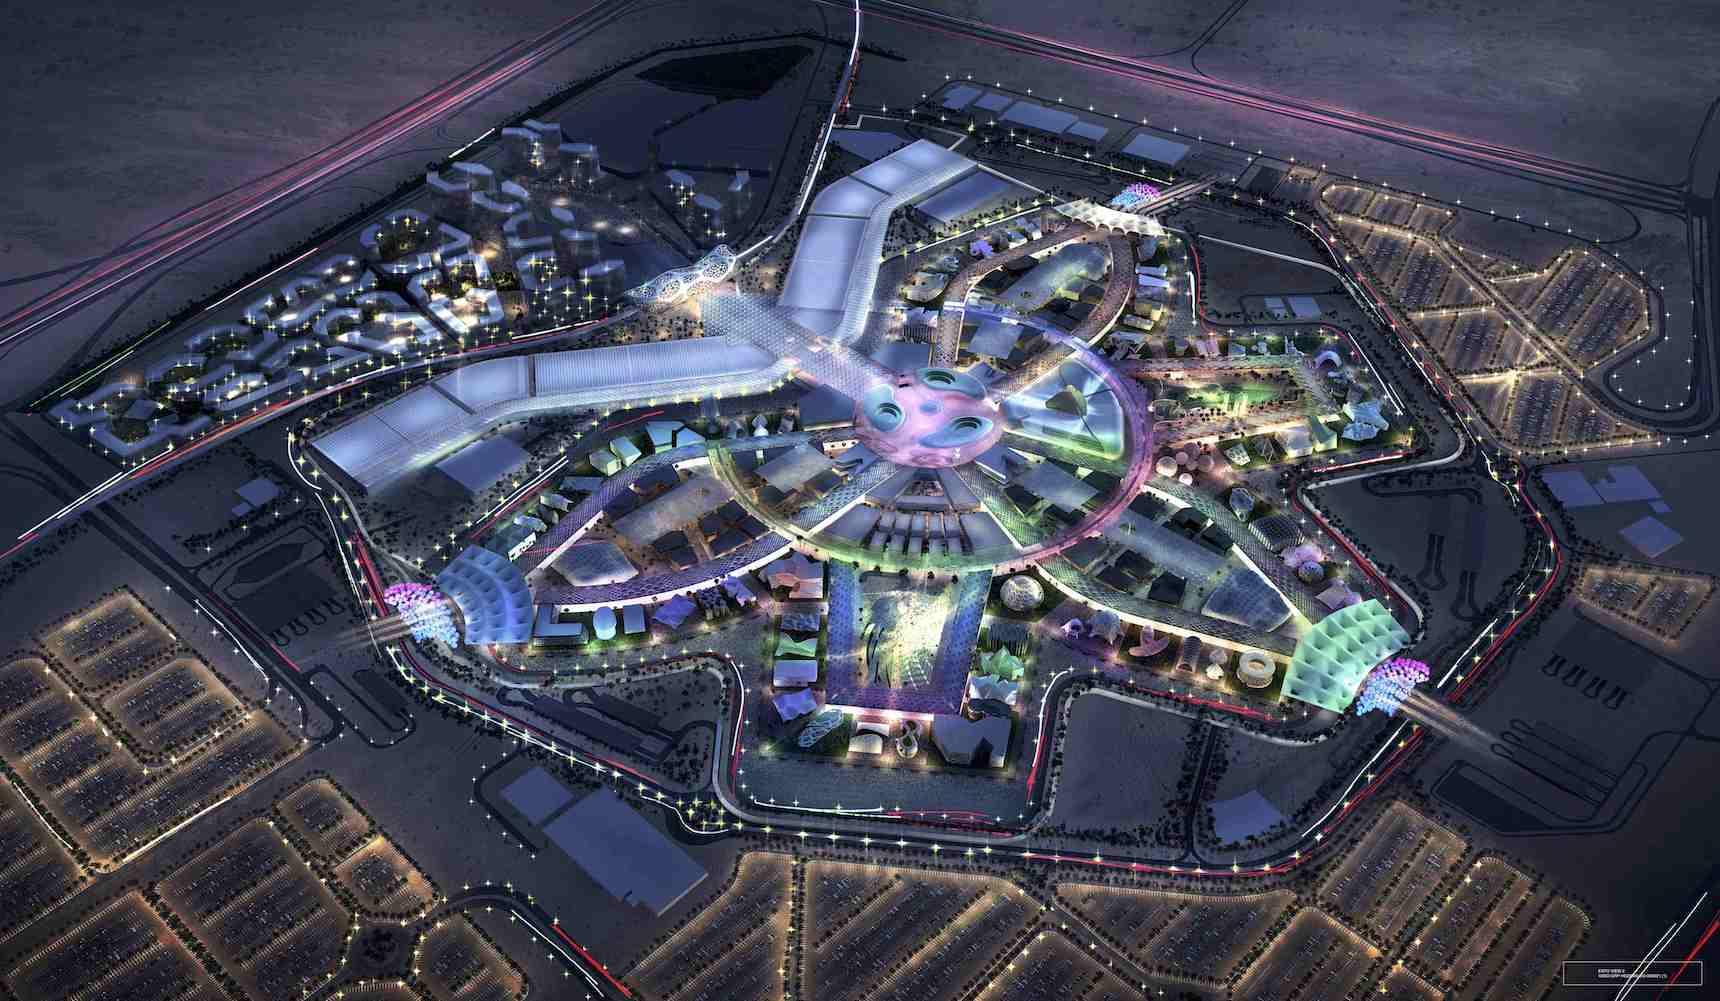 Expo_2020_Dubai_Master_Plan_(Image_-_ME_NewsWire)